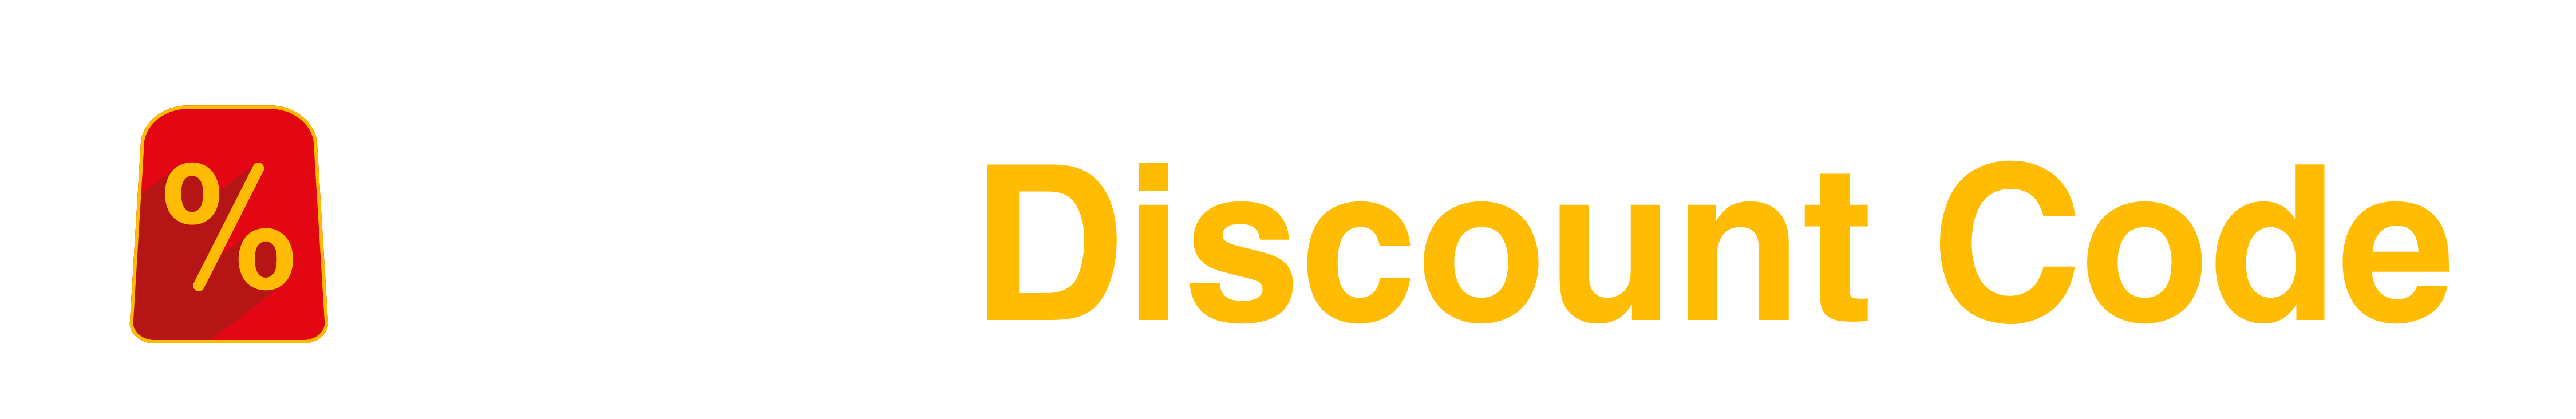 Get A Discount Code